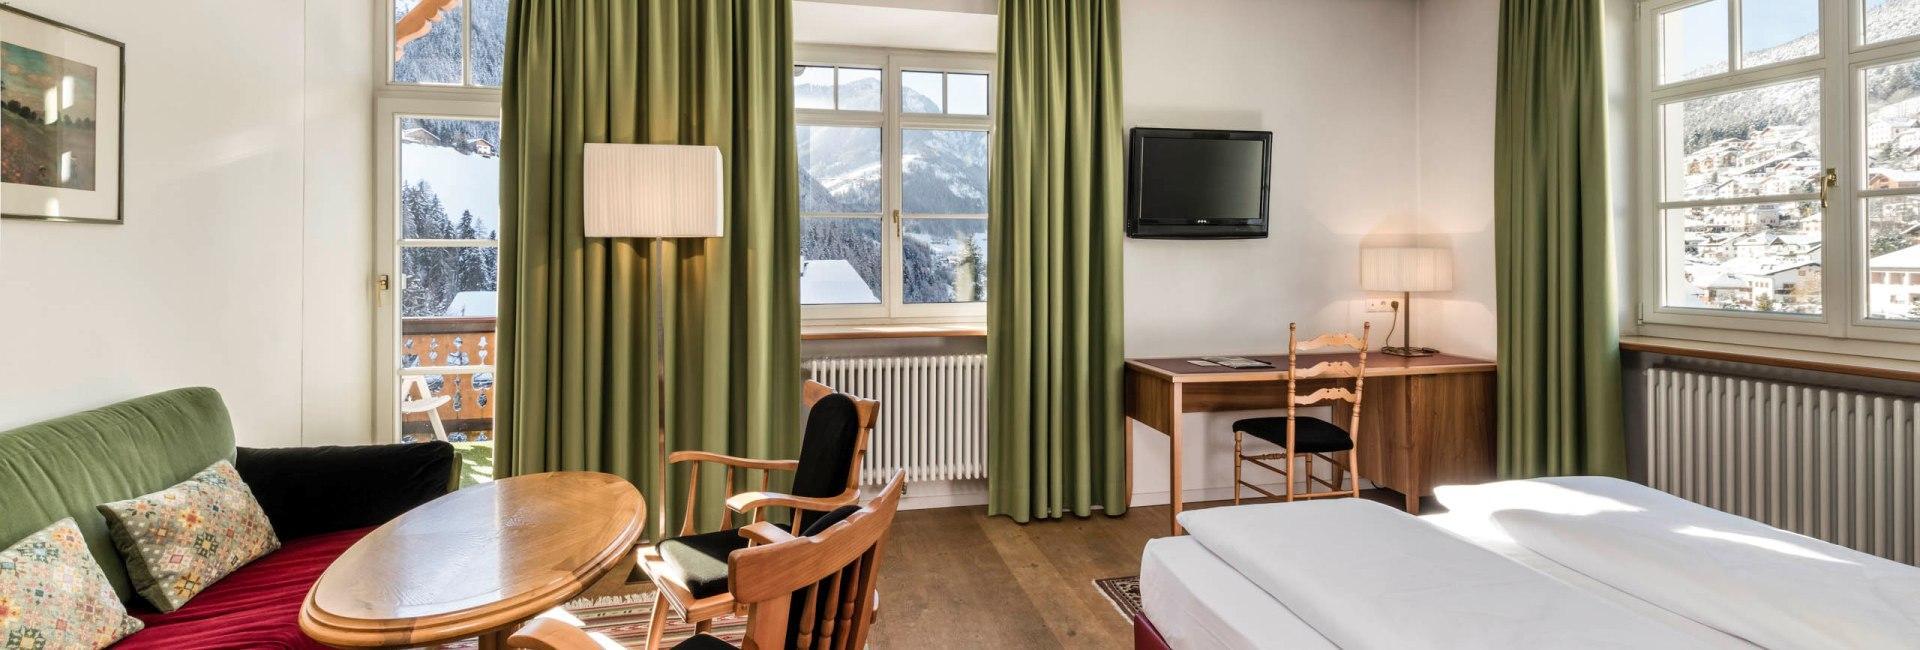 Hotel am Stetteneck, South Tyrol